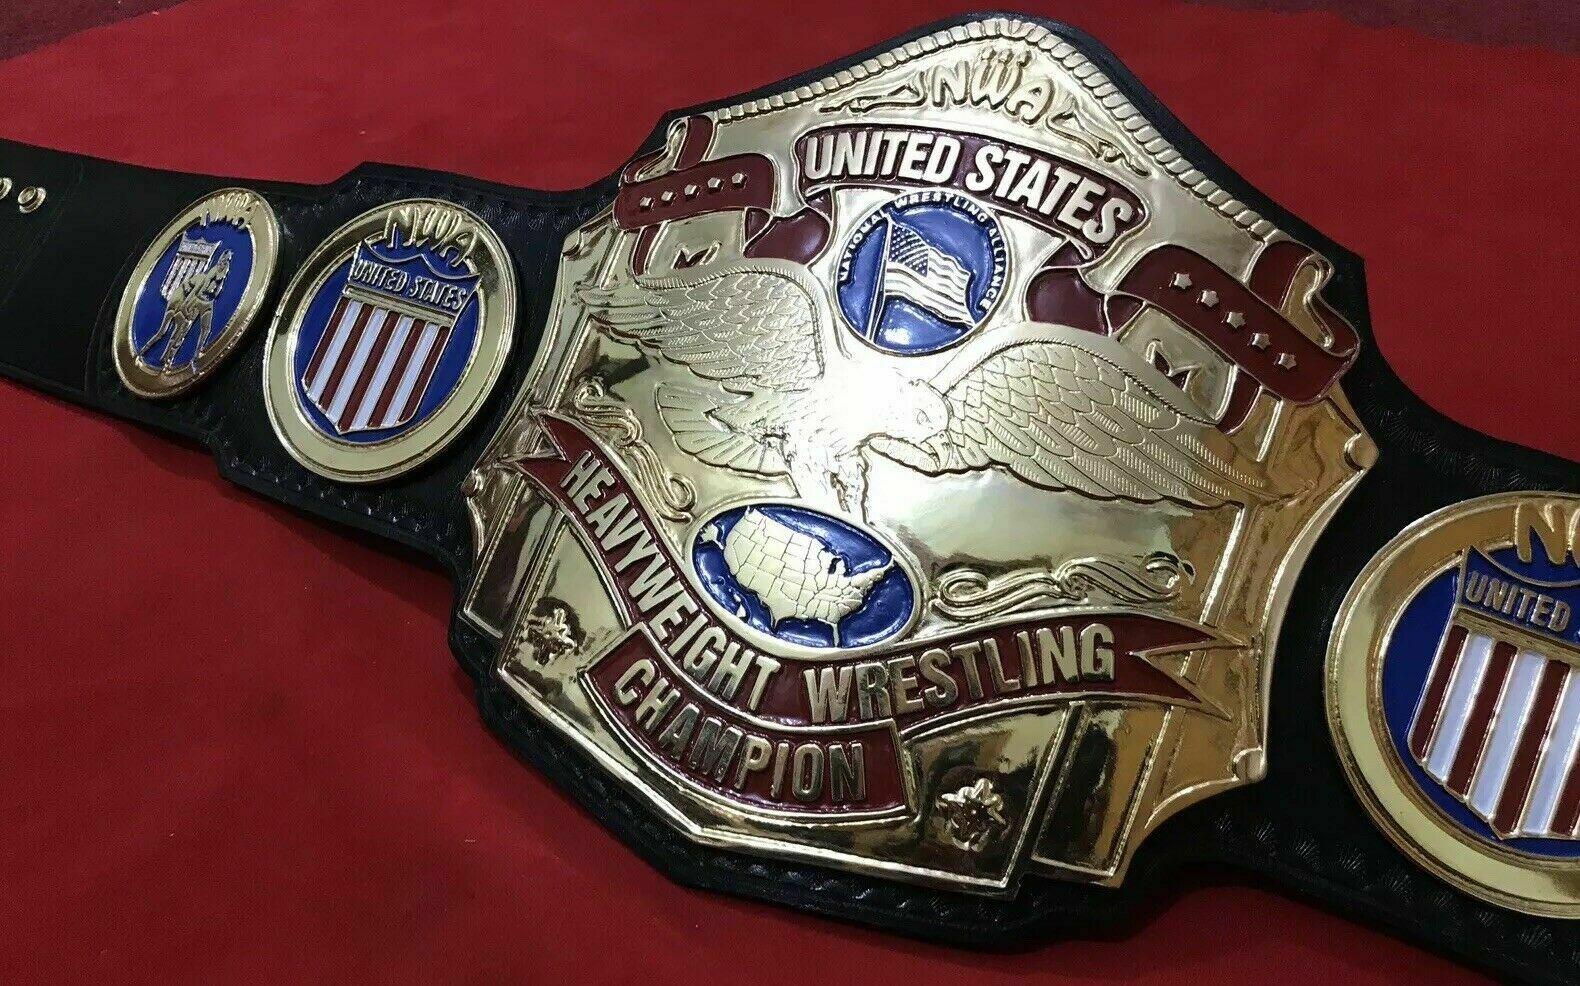 NWA United States Heavyweight Wrestling Championship Belt - $325